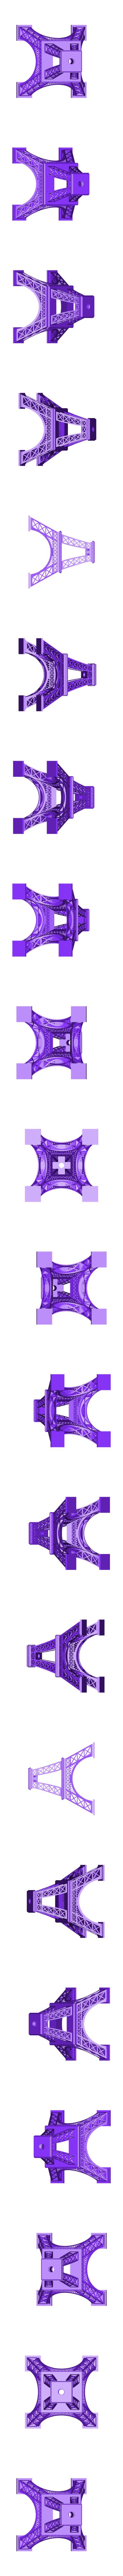 eiffel_line_B1.stl Download free STL file Eiffel tower lamp • 3D printable object, Toolmoon